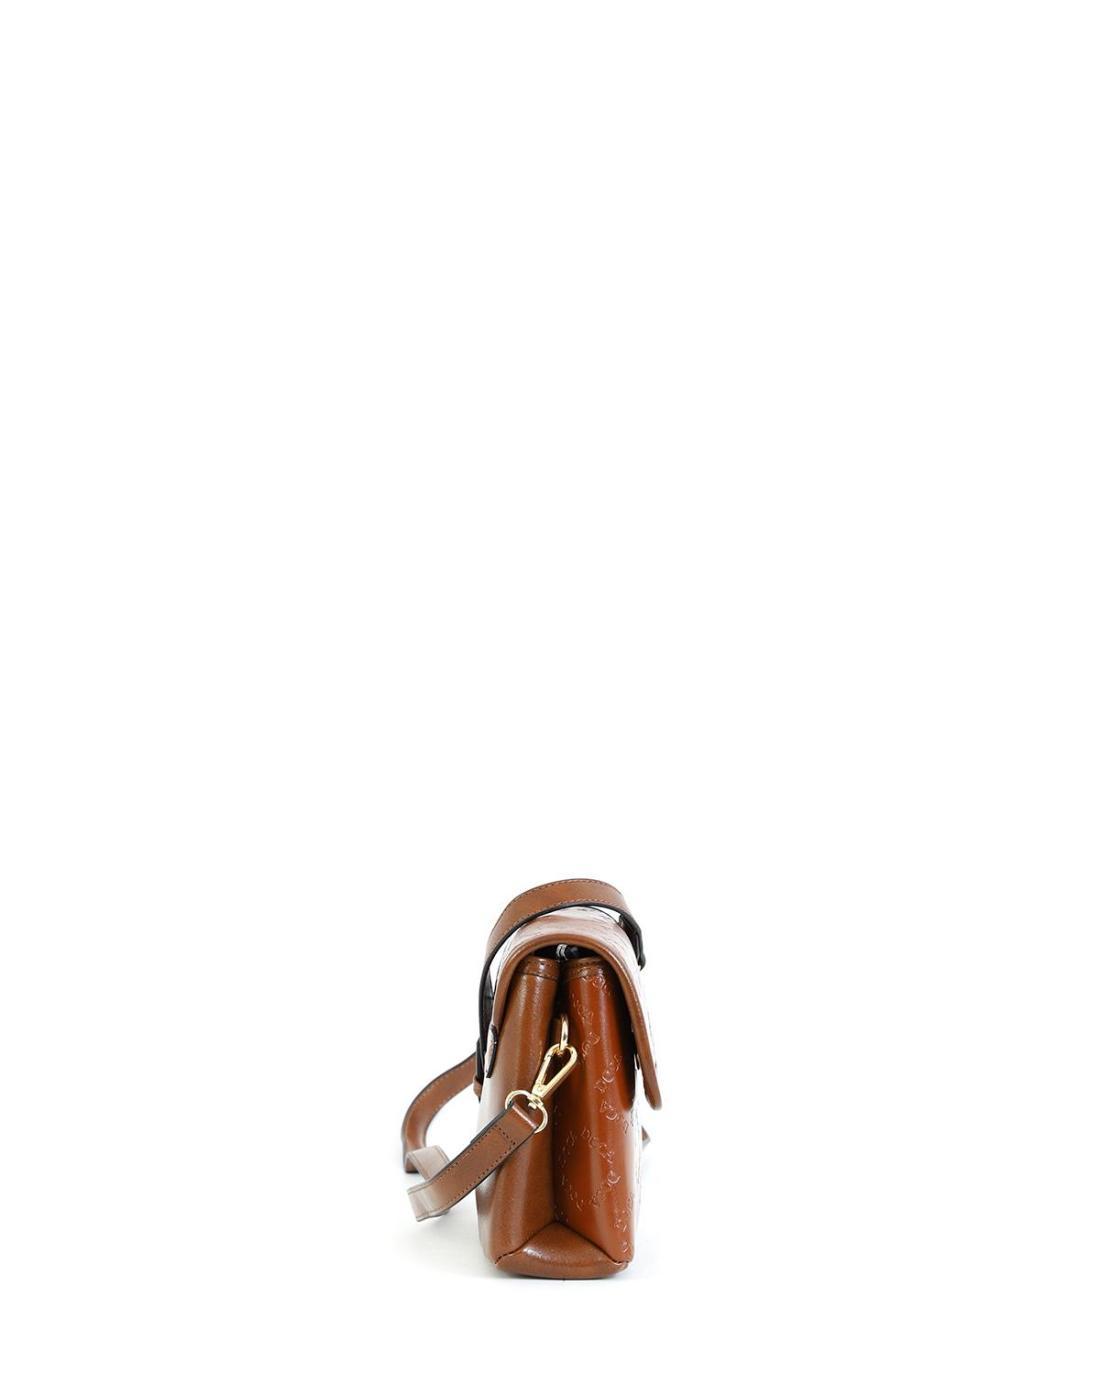 Camel cross body bag